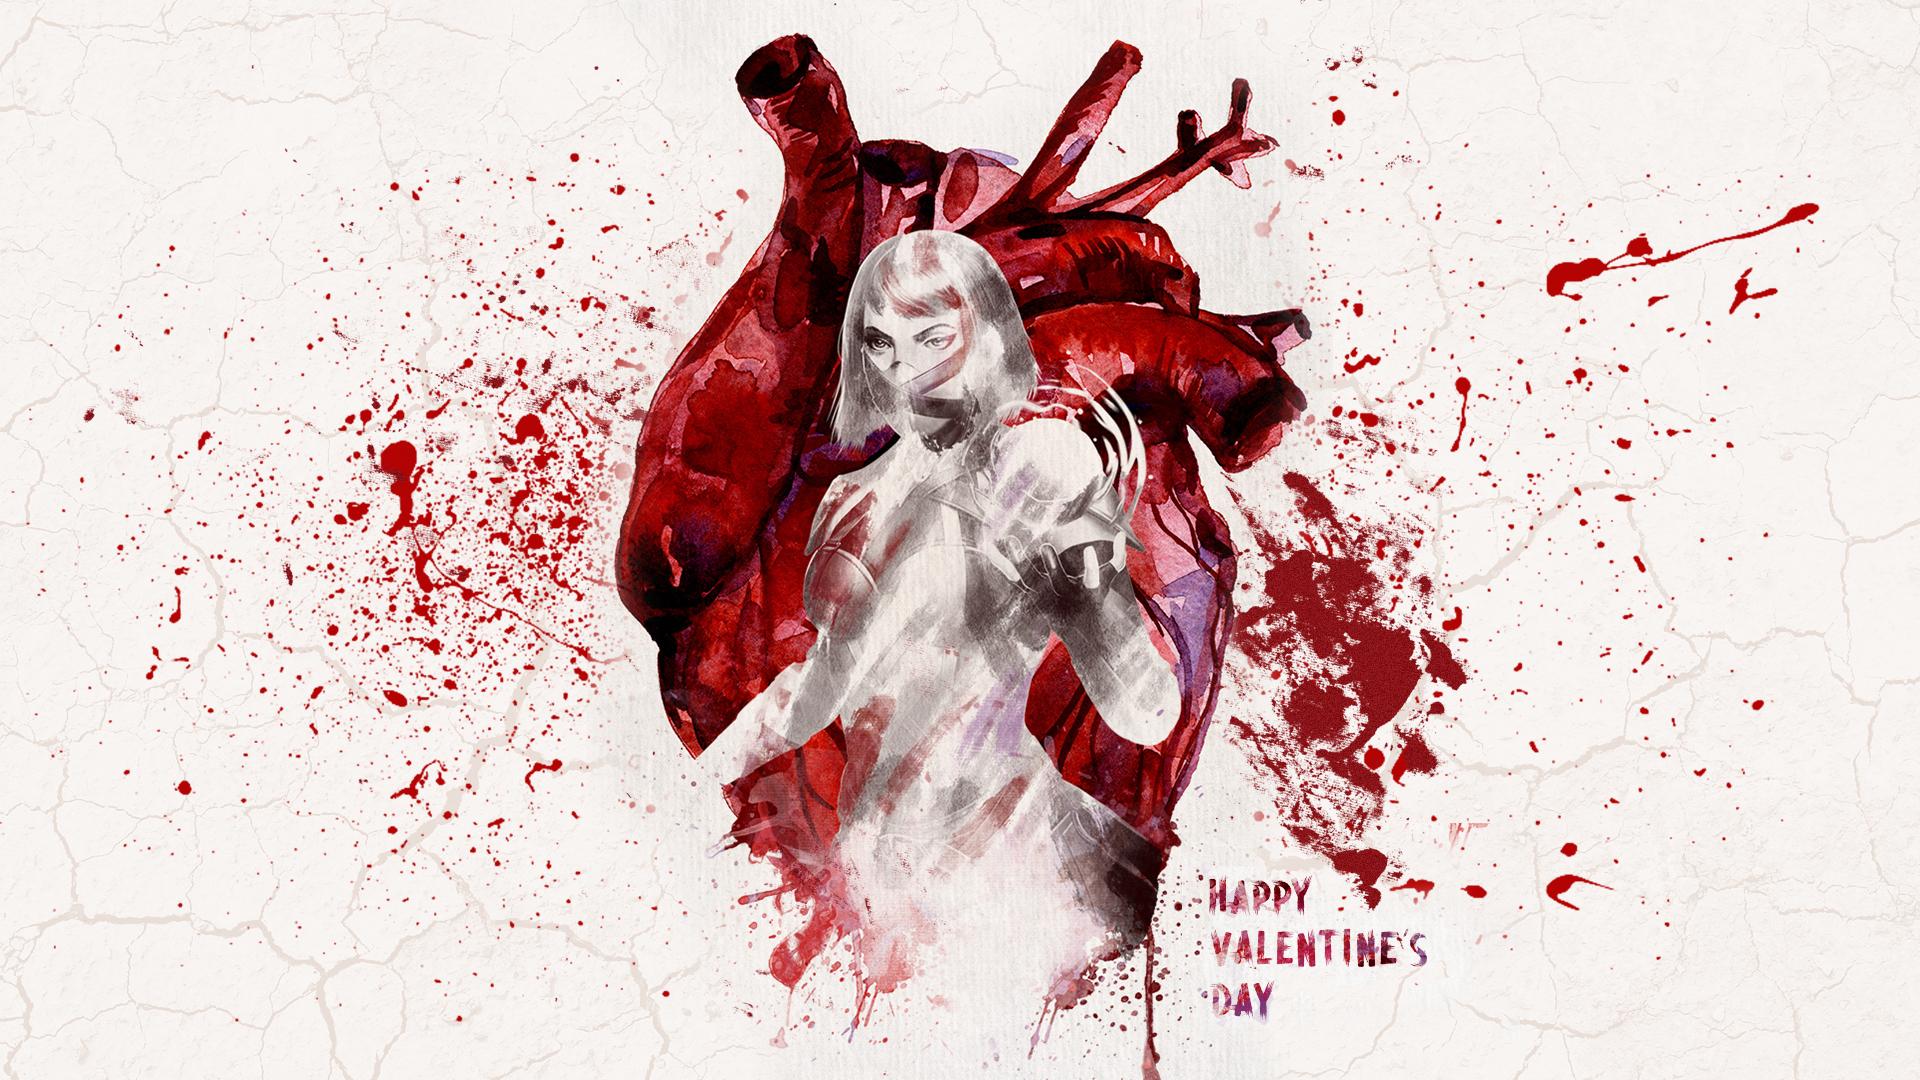 Wallpaper Happy Valentine's Day